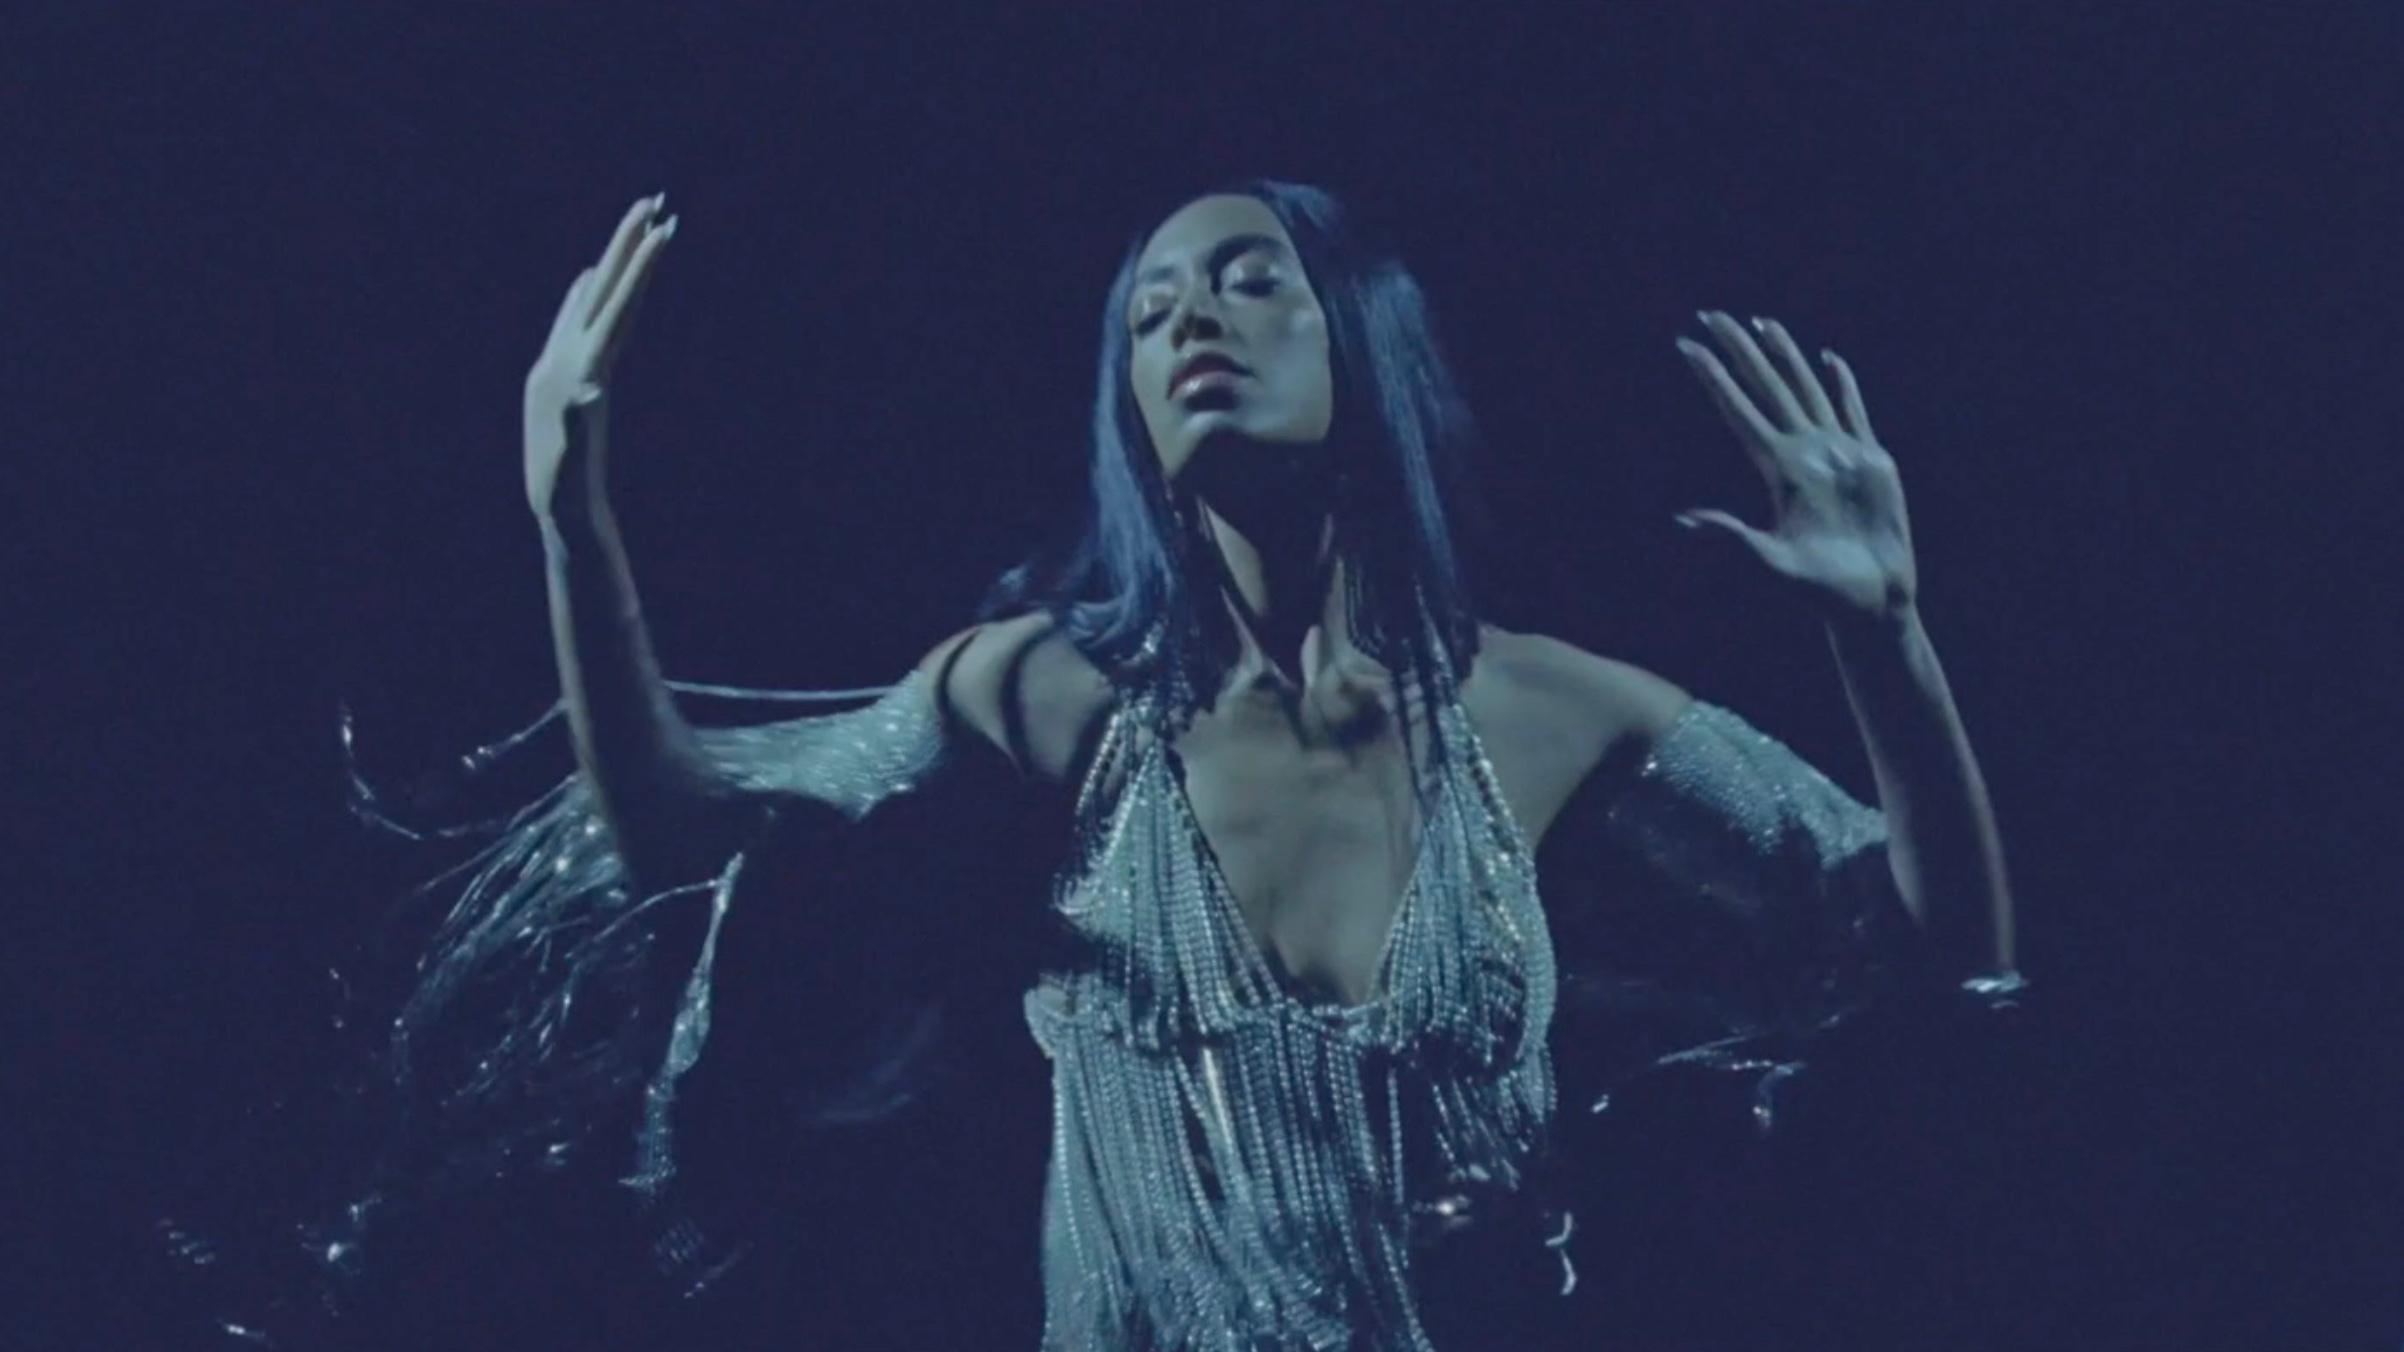 9 - Solange _When I Get Home_ Visual Album.jpg